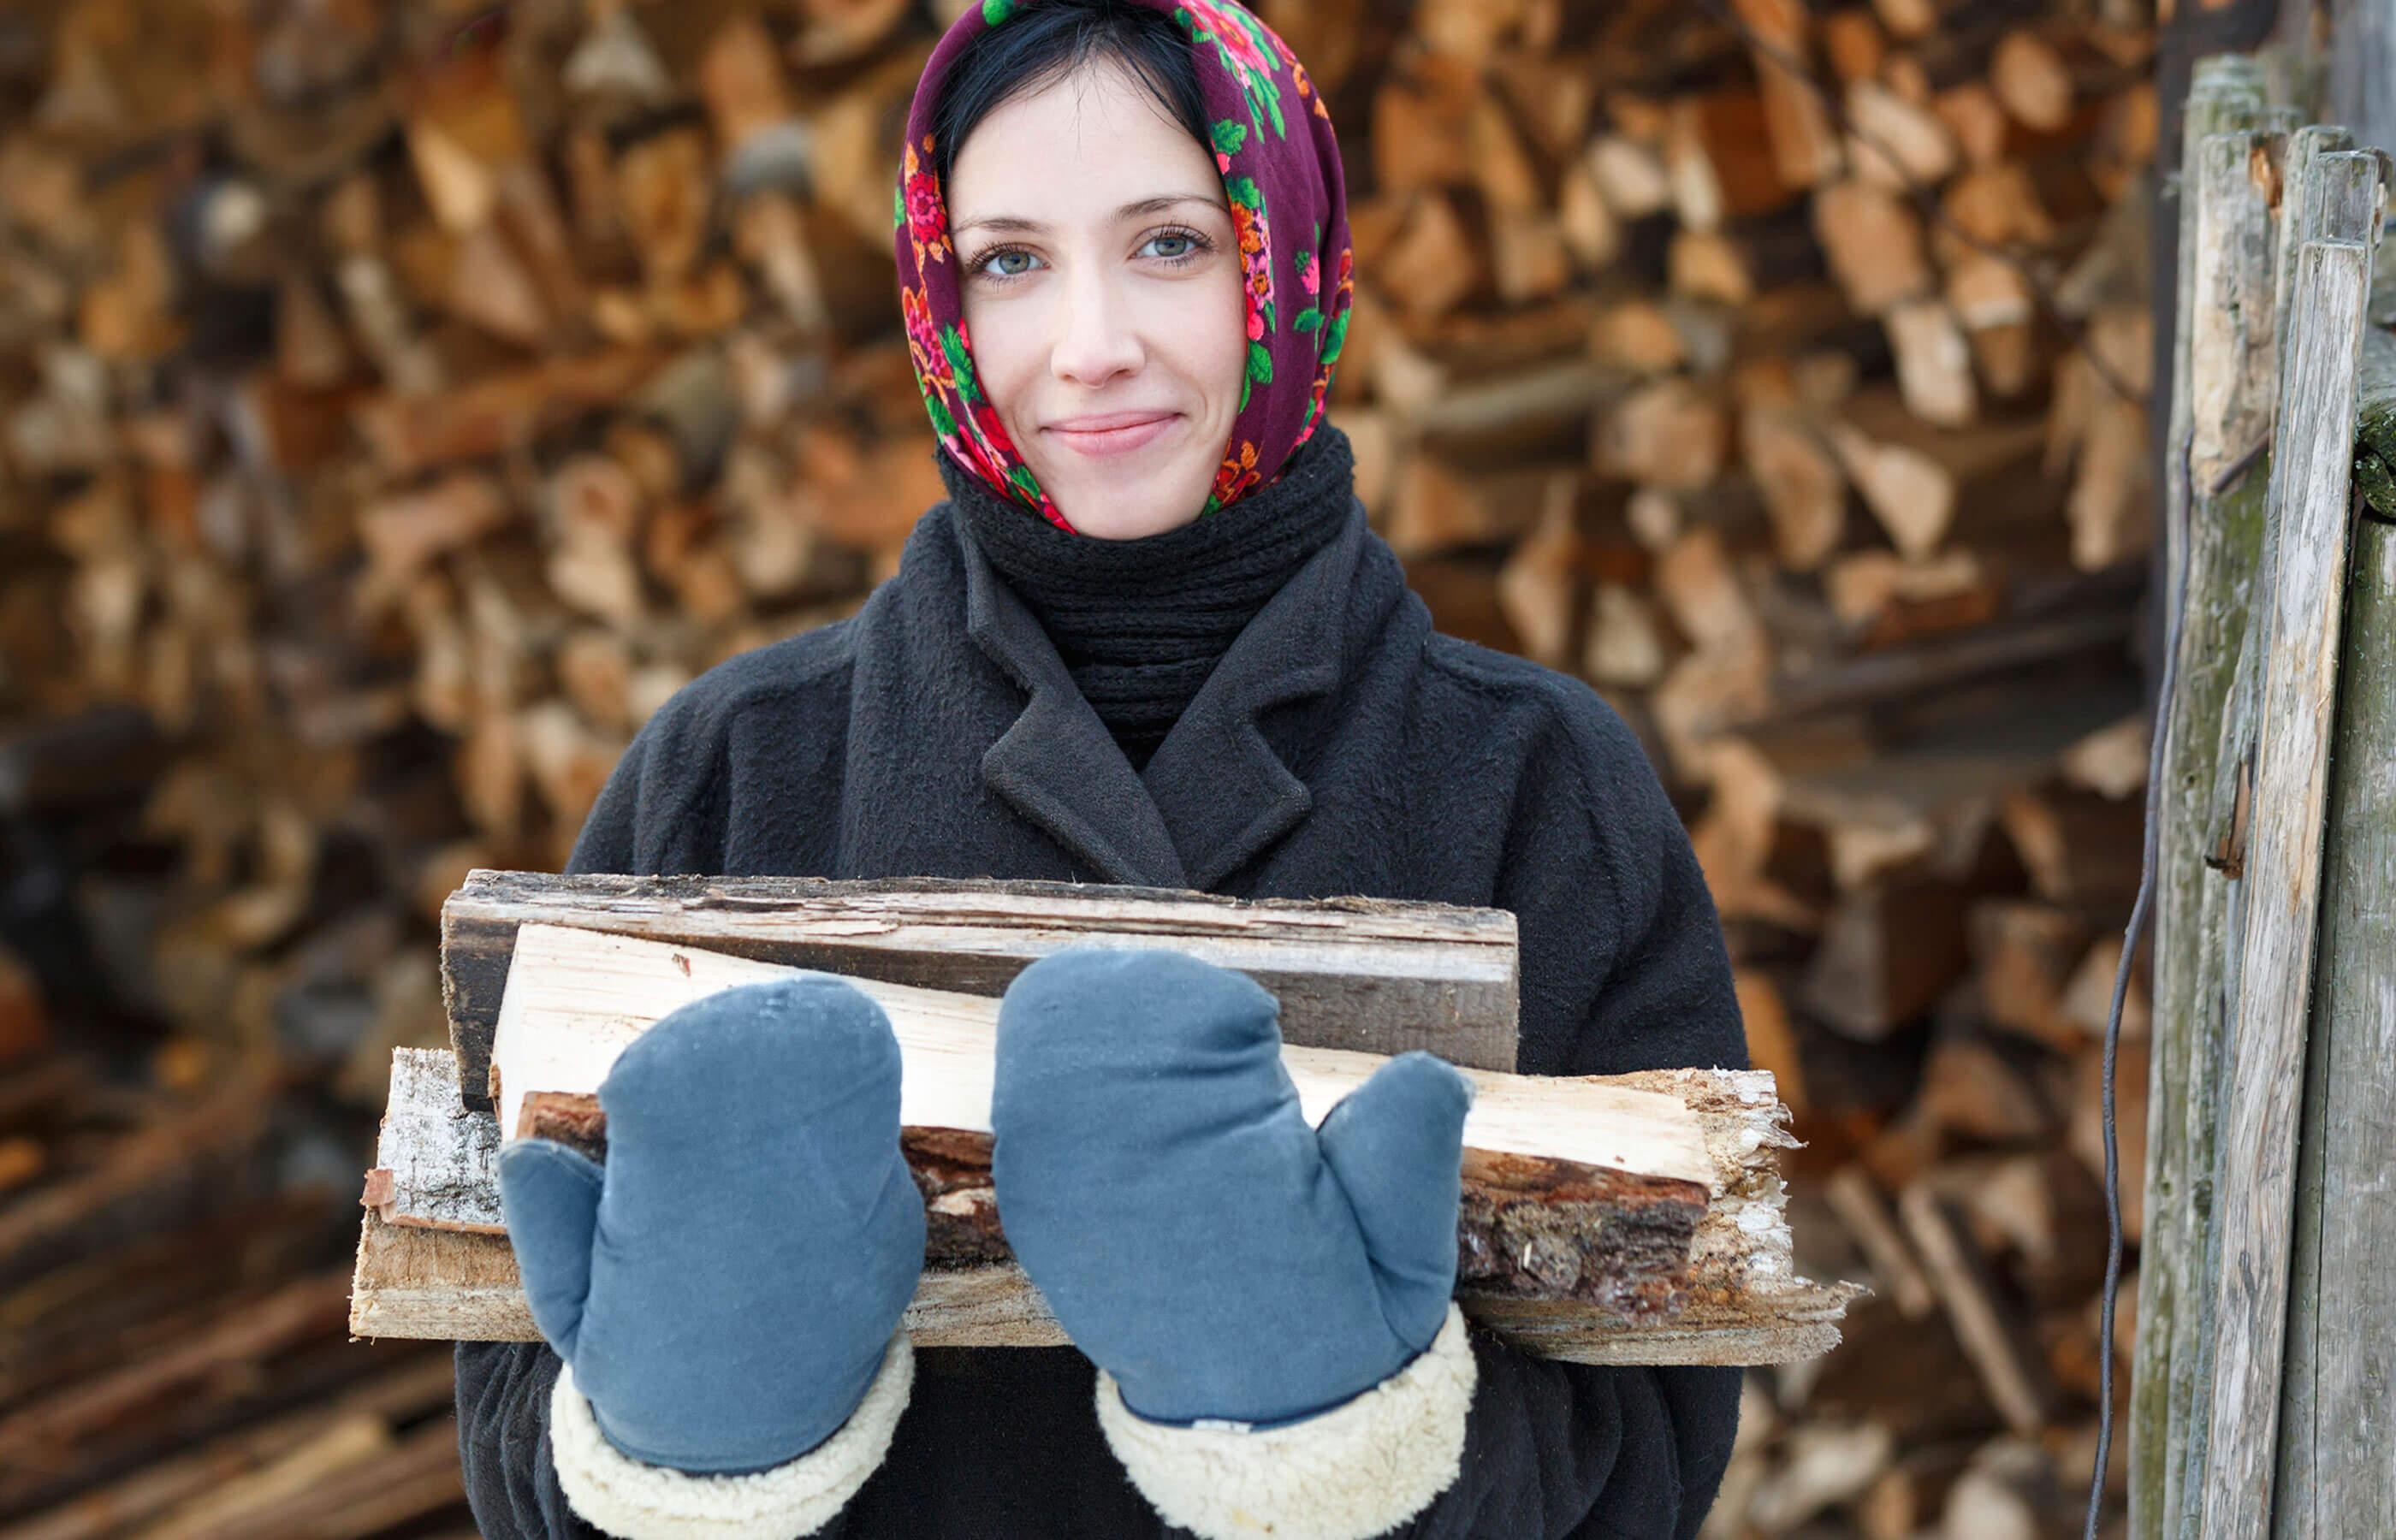 Bioenergie aus Holz